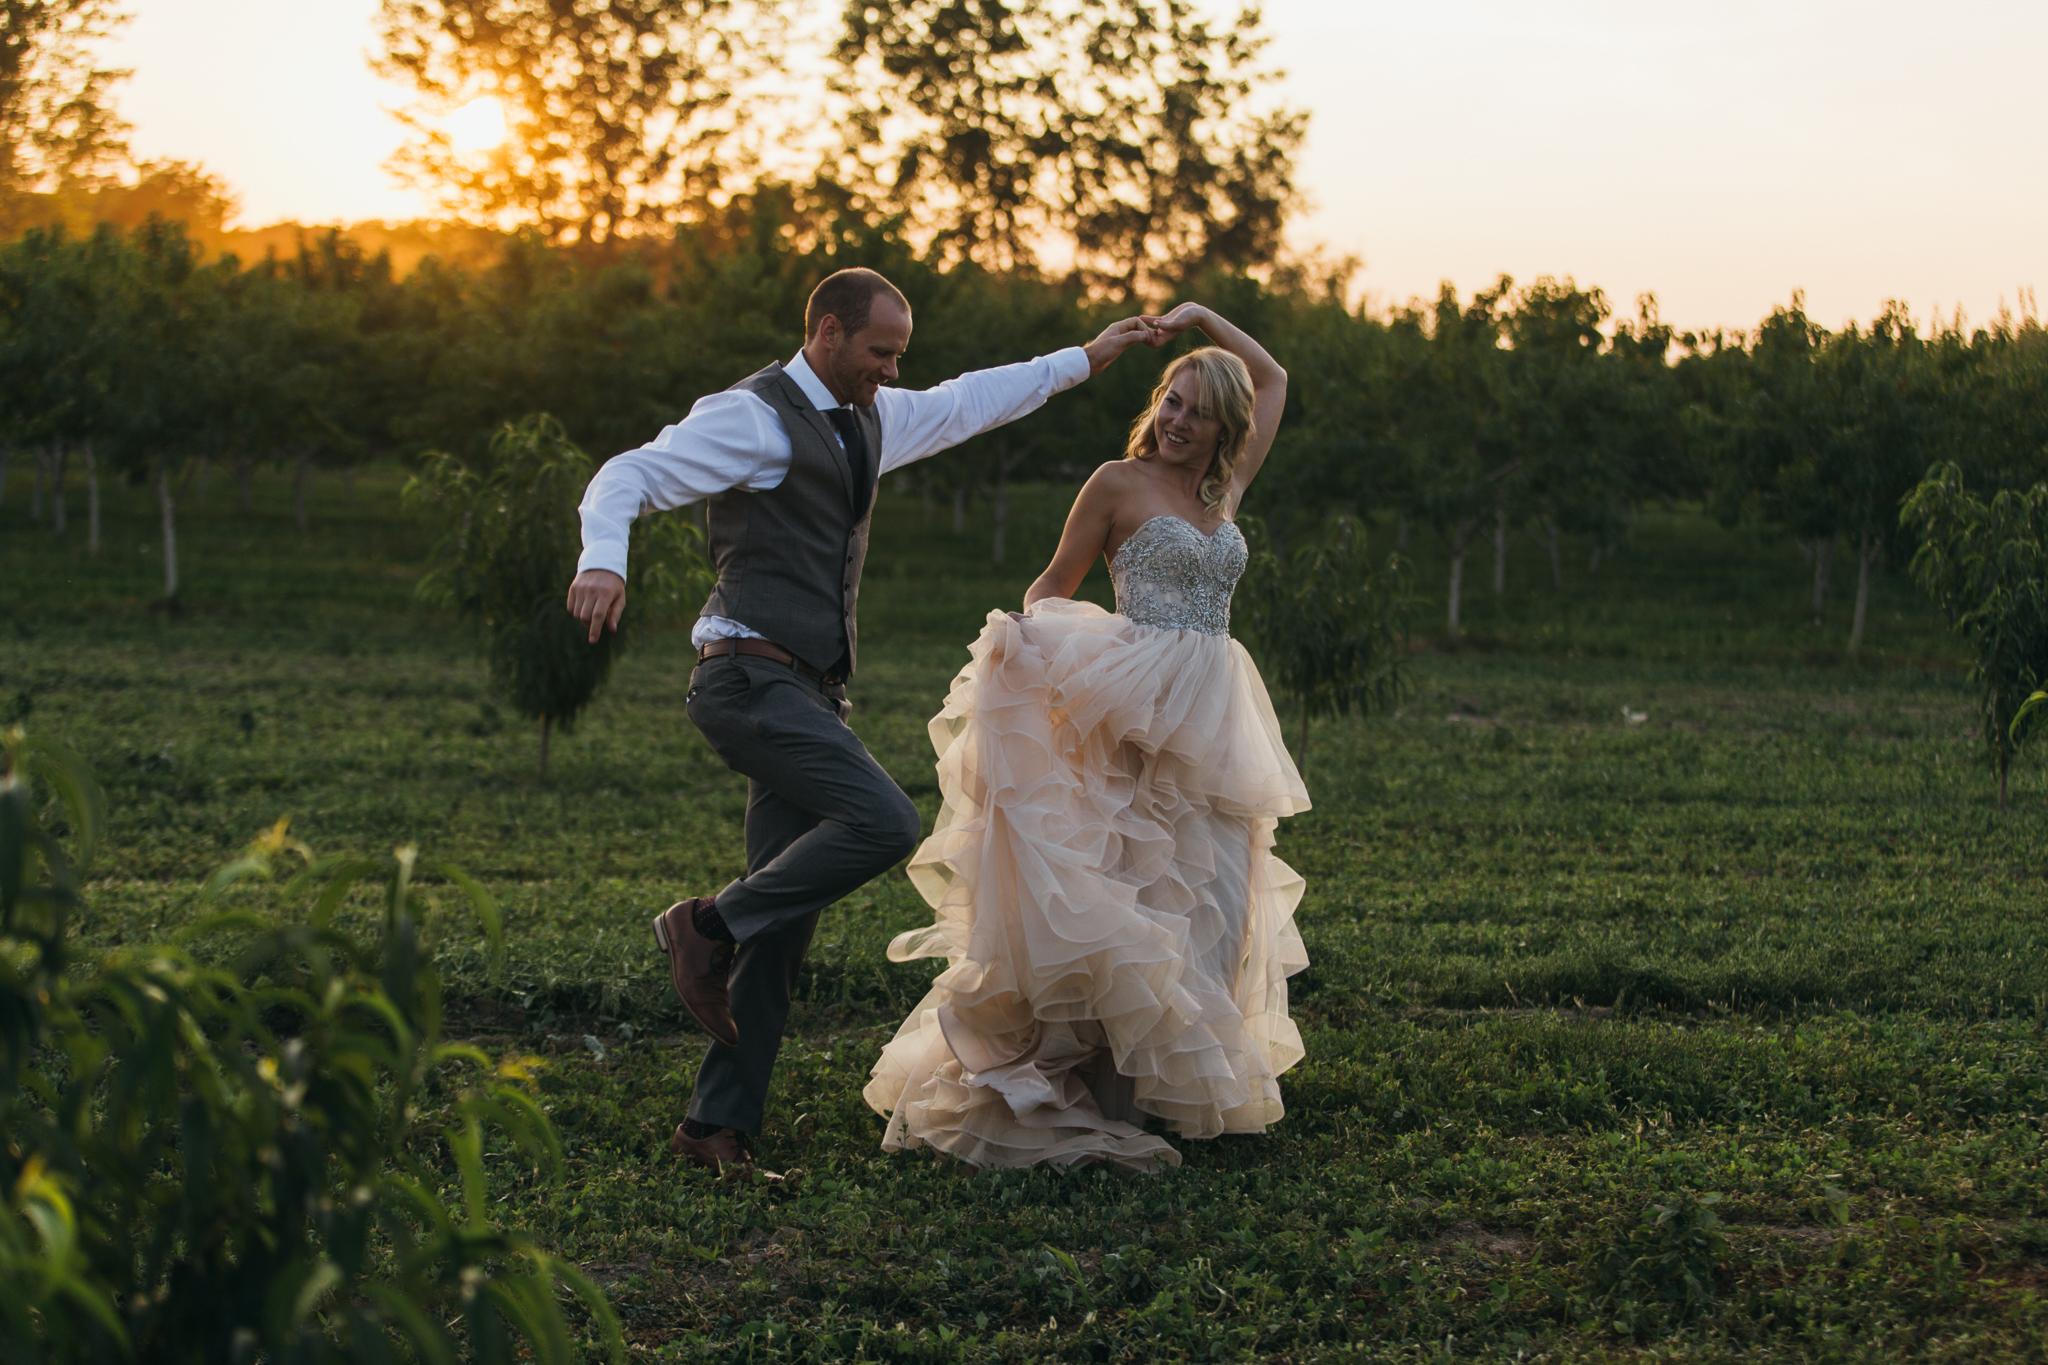 Kurtz Orchard Wedding Photographer Niagara on the Lake (94 of 109).jpg